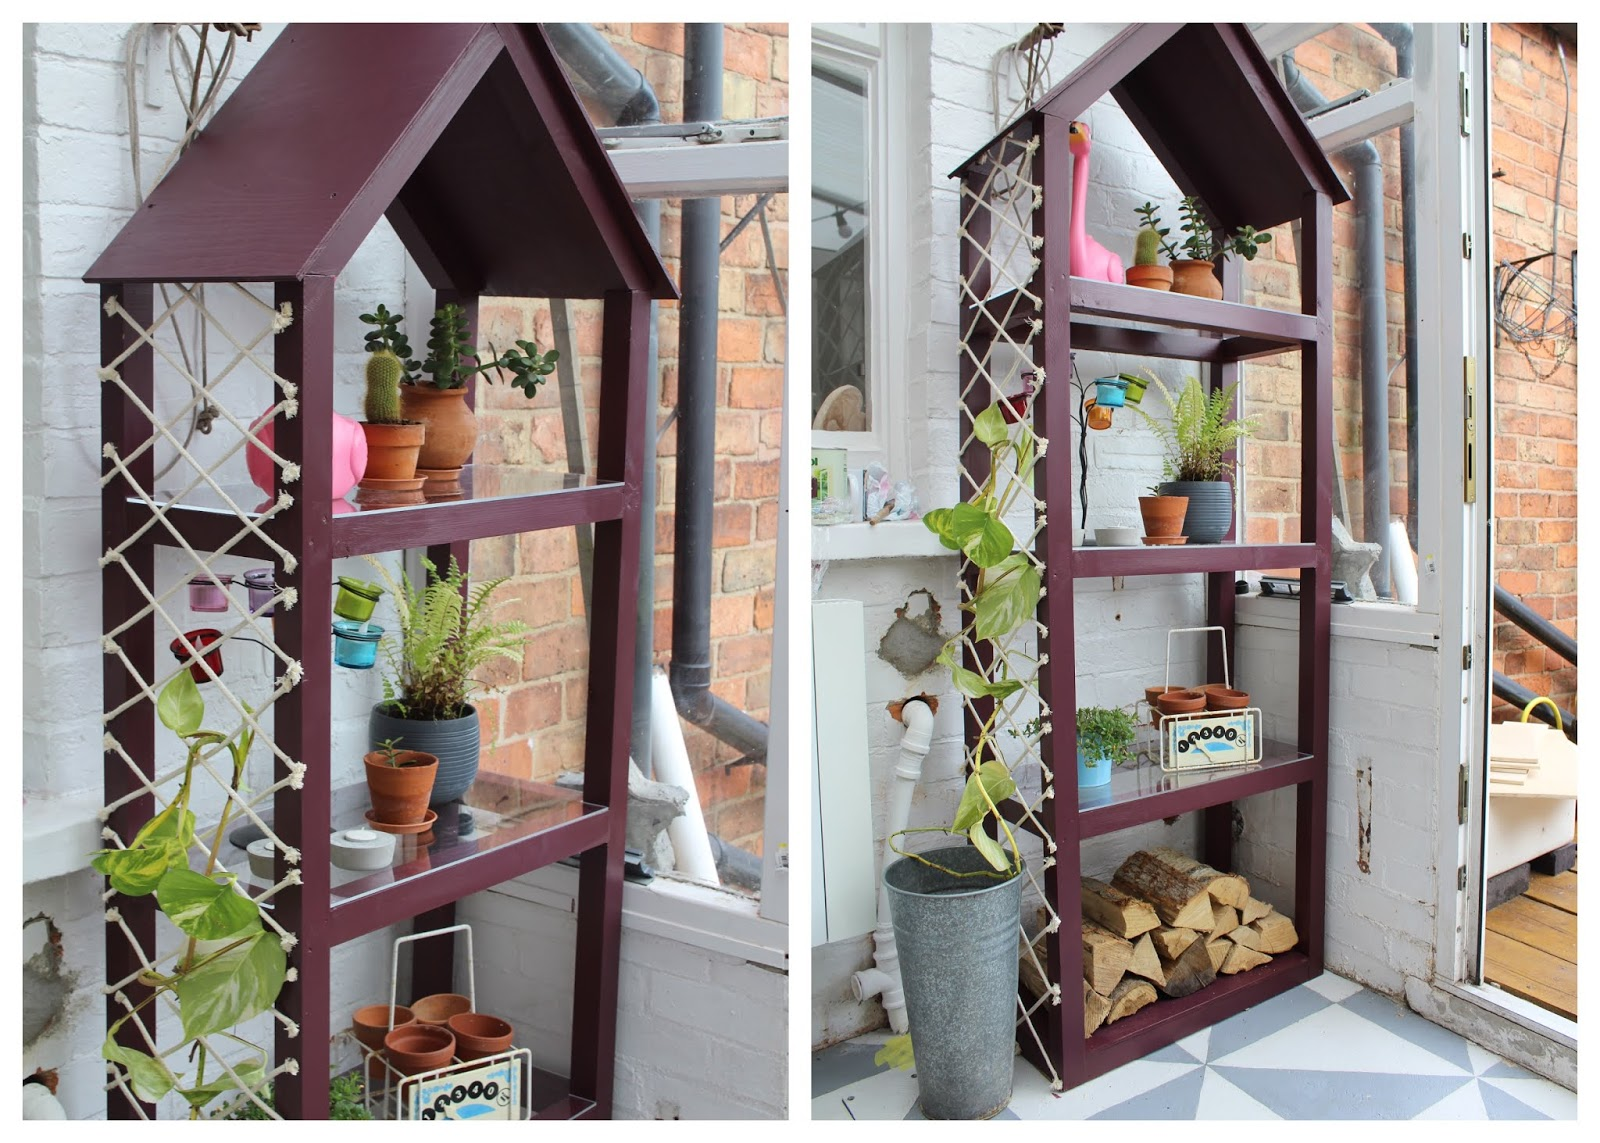 DIY Mini Greenhouse with Trellis